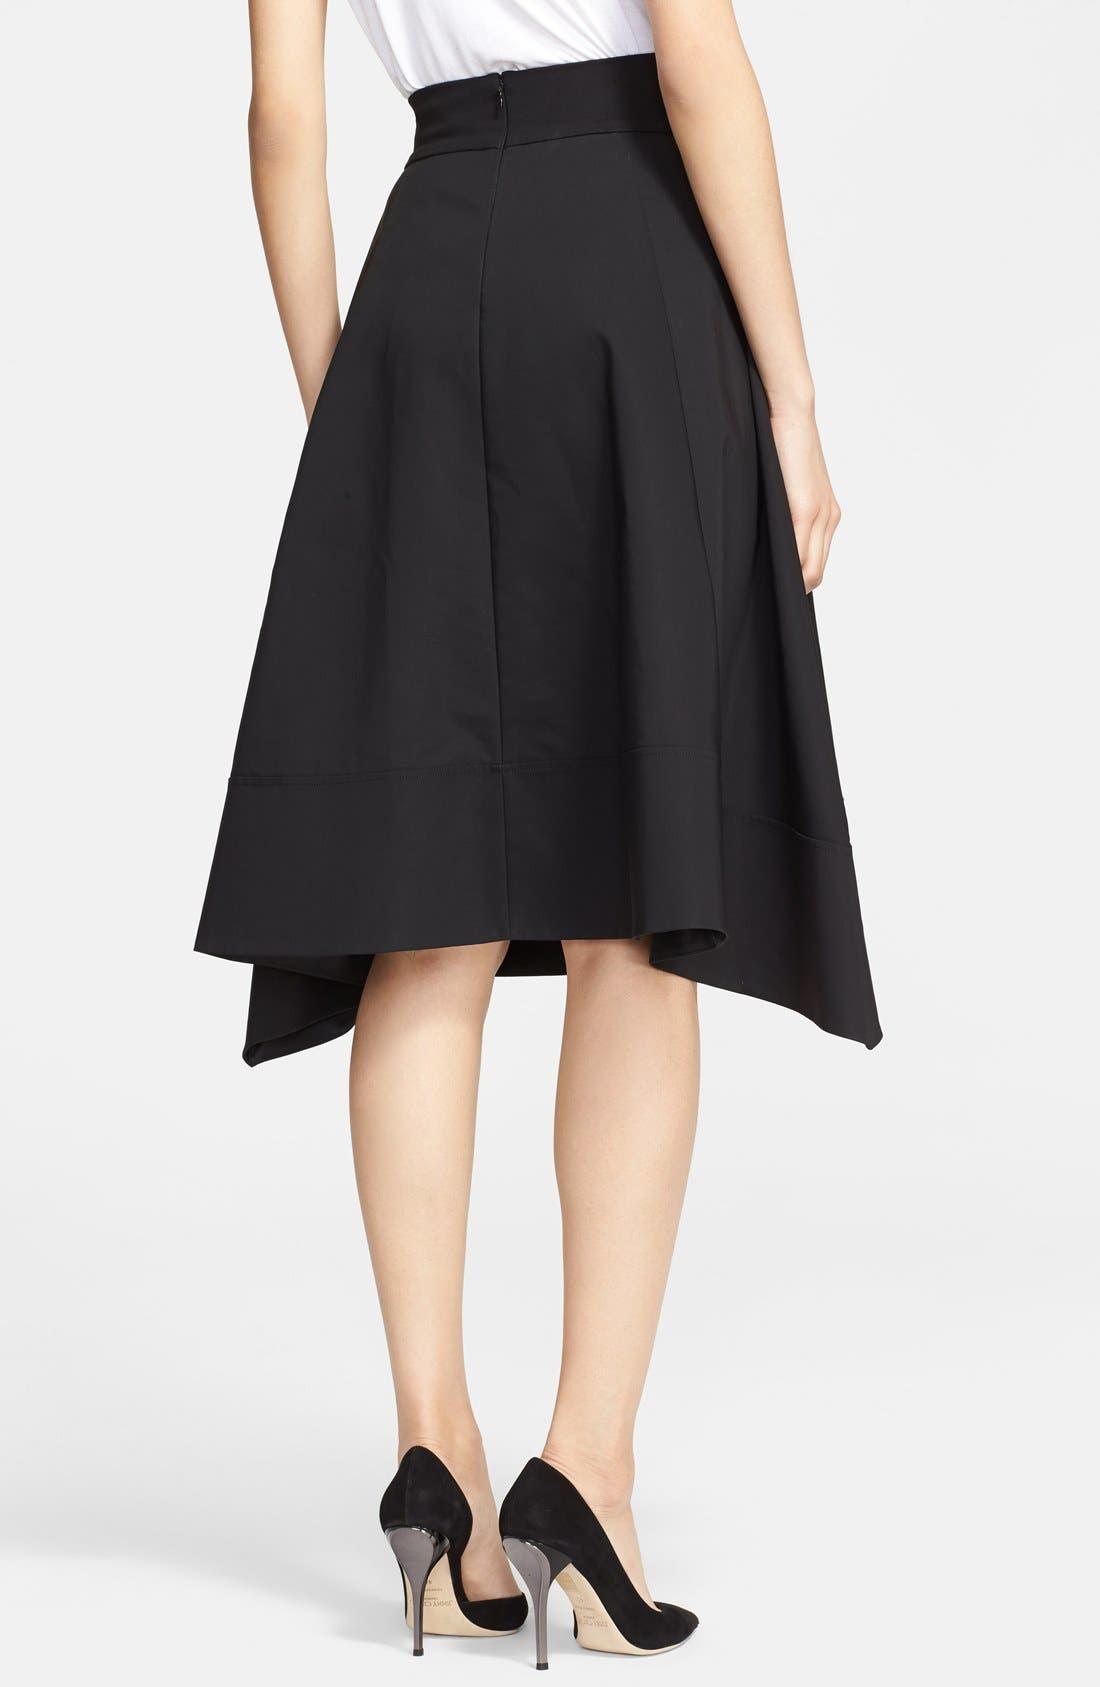 Donna Karan Collection Cotton Taffeta Skirt,                             Alternate thumbnail 3, color,                             001